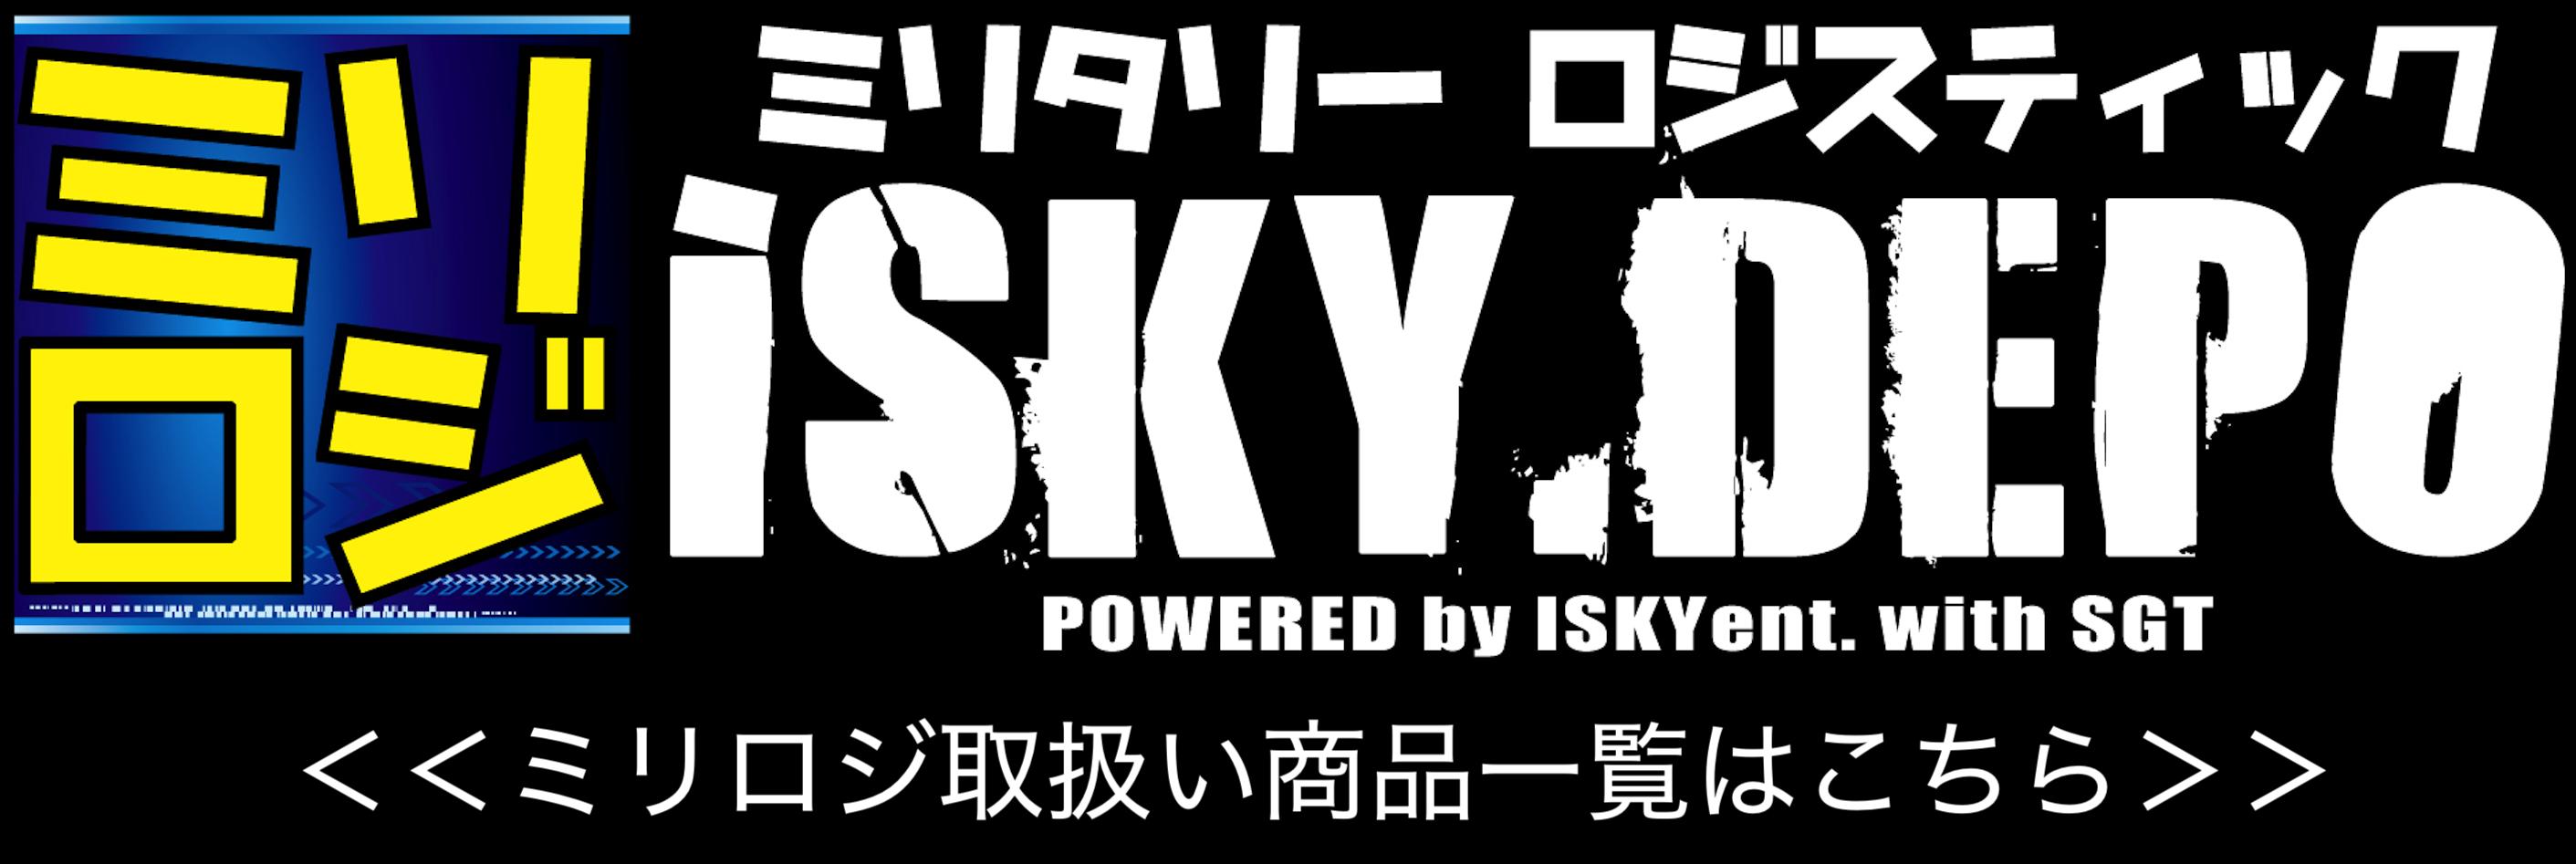 ISKY.DEPO委託販売ミリタリーロジステック